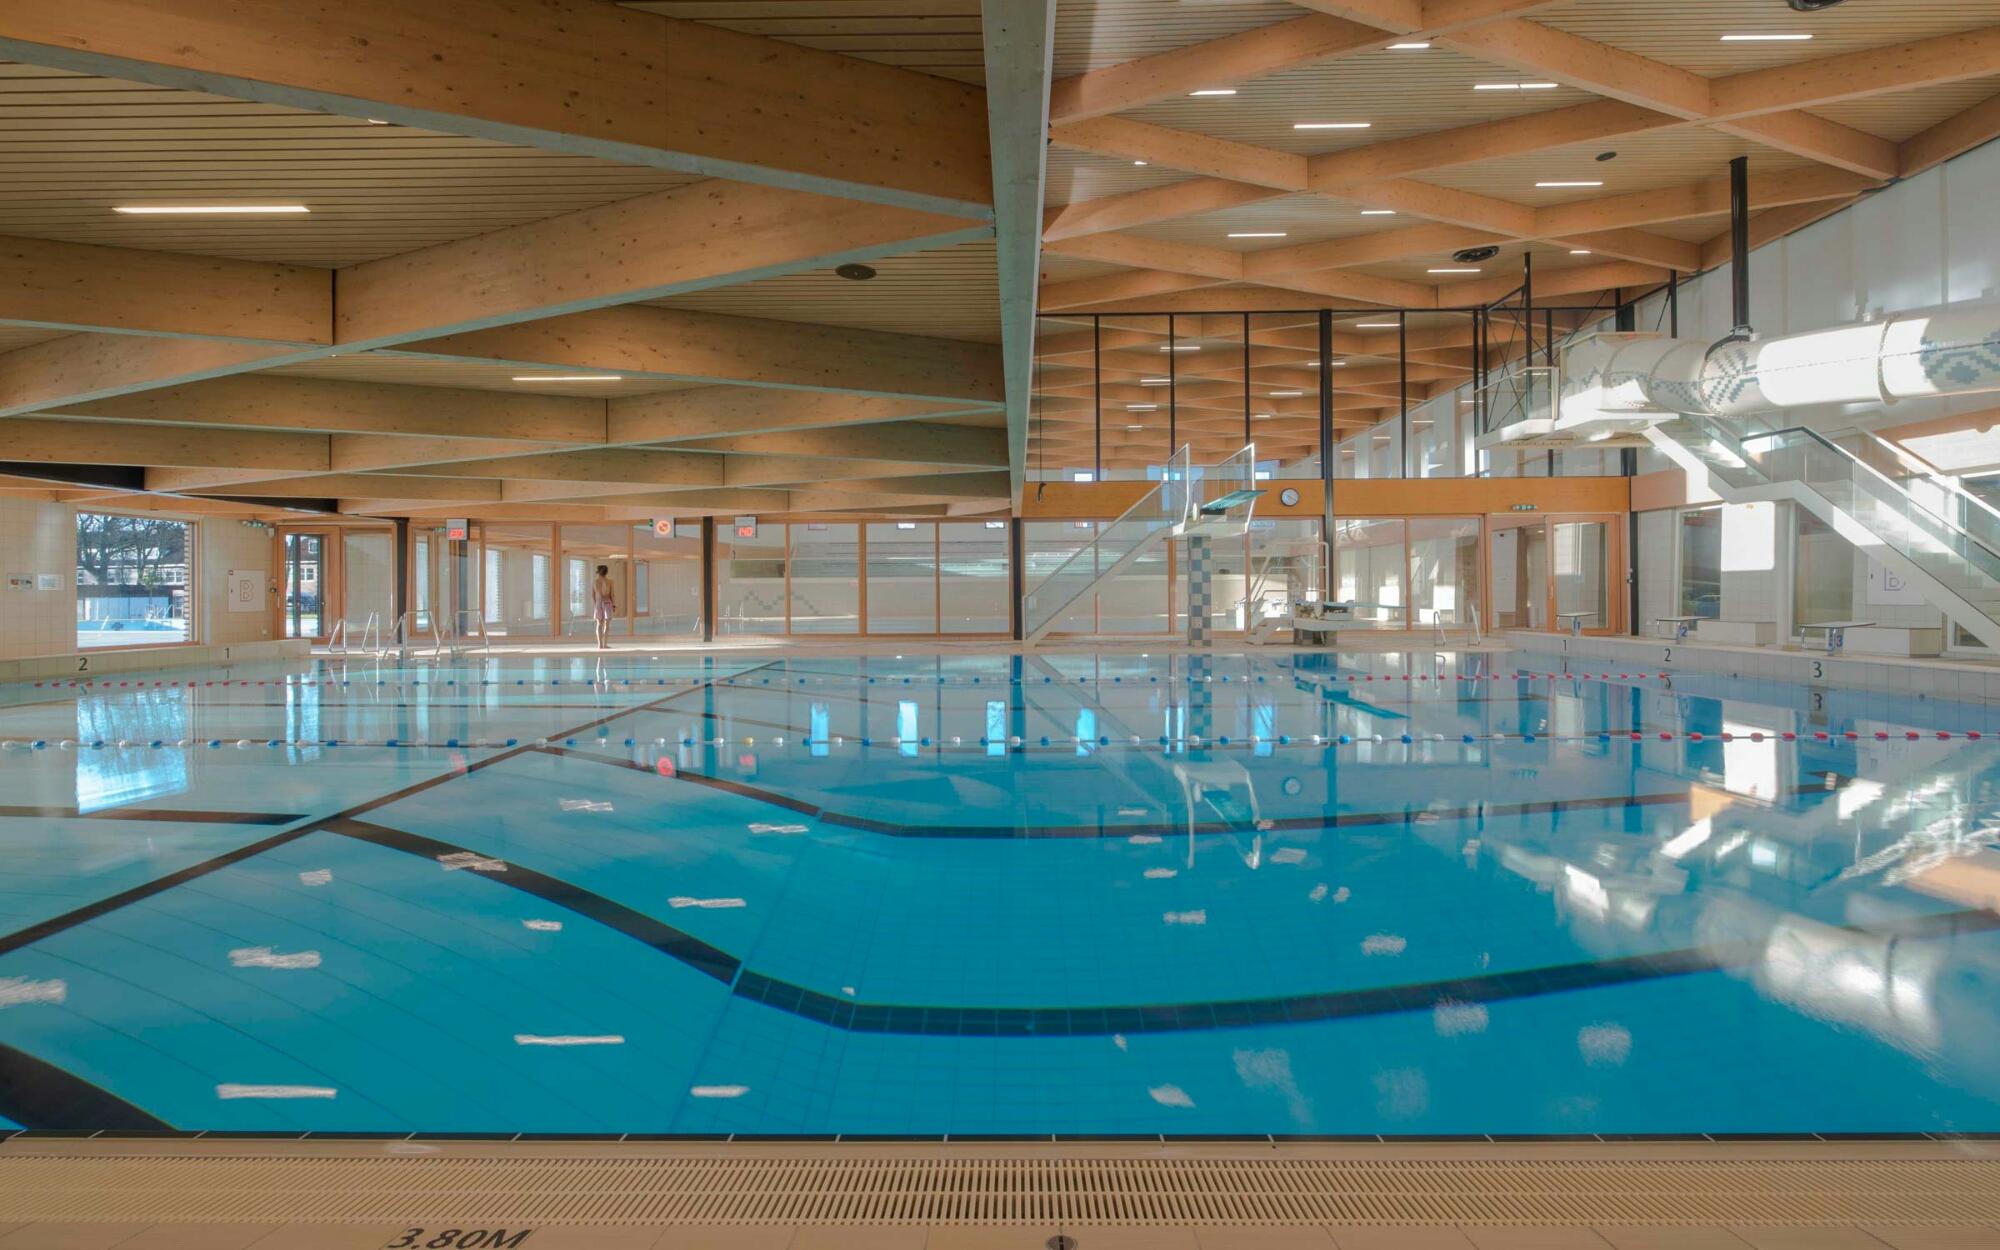 Amsterdam Swimming Pool Wins Most Beautiful Public Pool Competition Photos Illuminaija